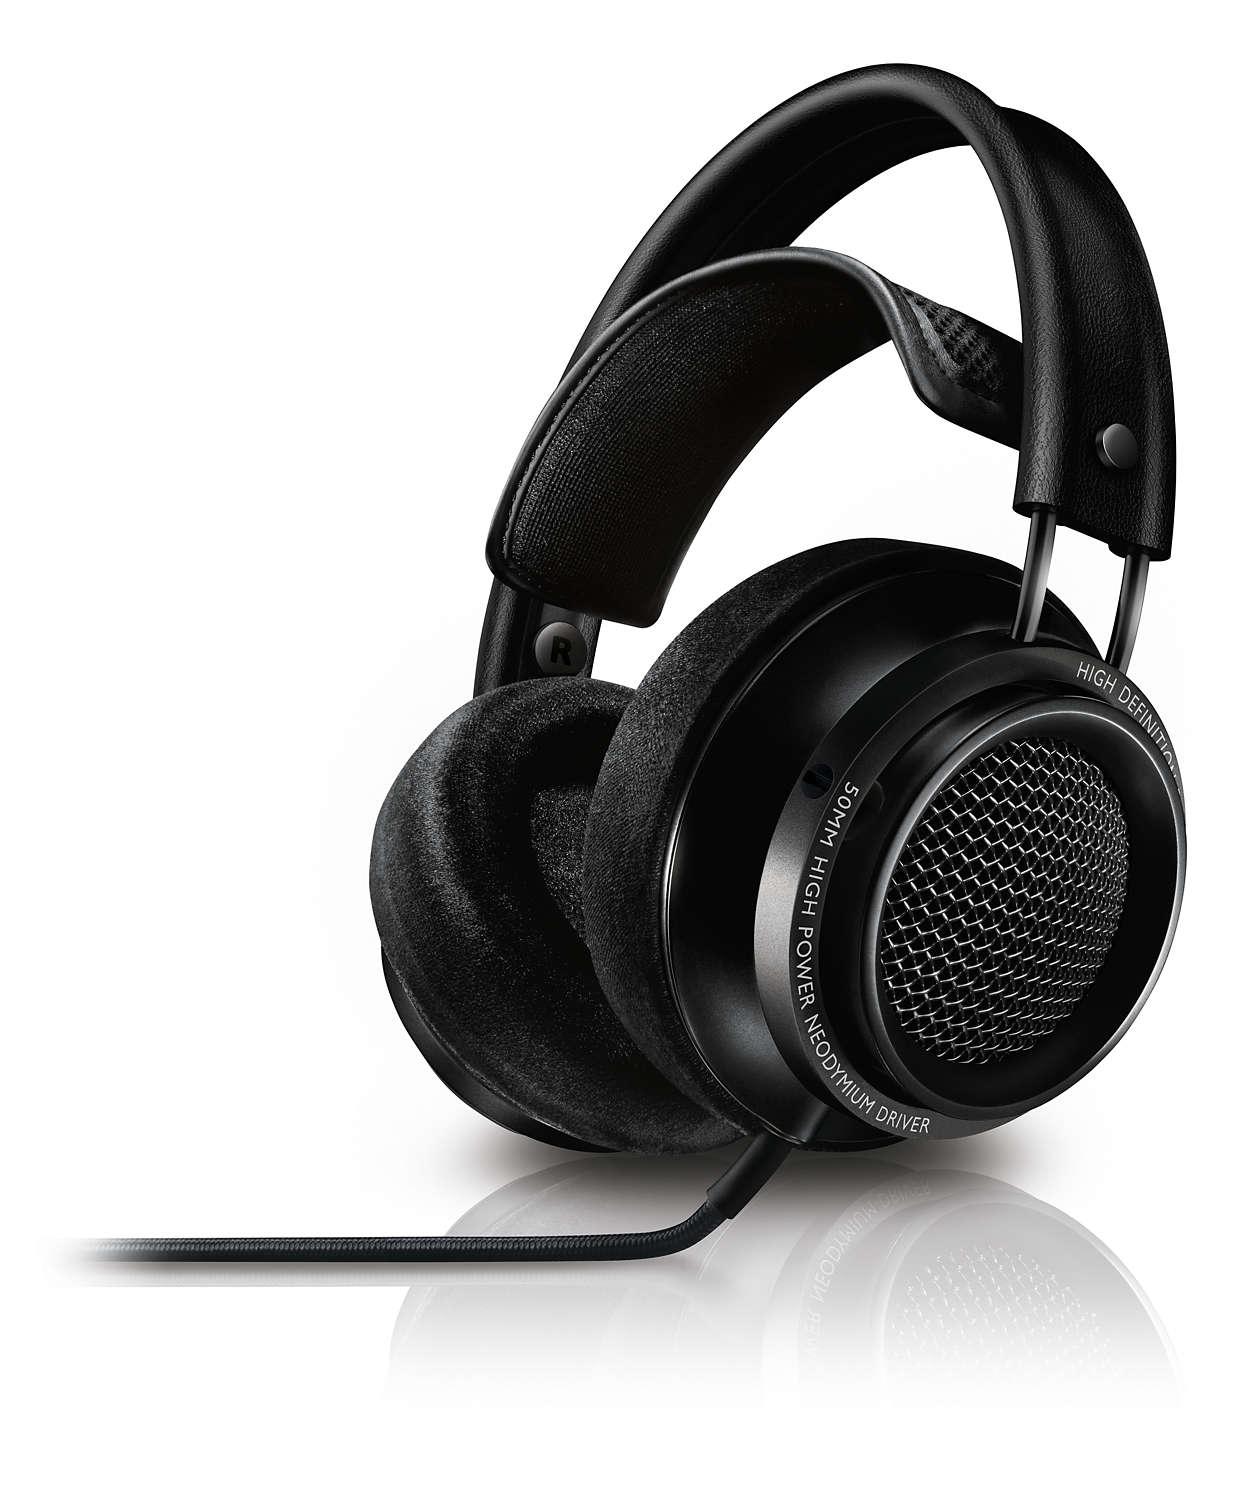 Philips X2/27 Fidelio Premium Headphones, Black for $199.99 + 5$ shipping at Massdrop